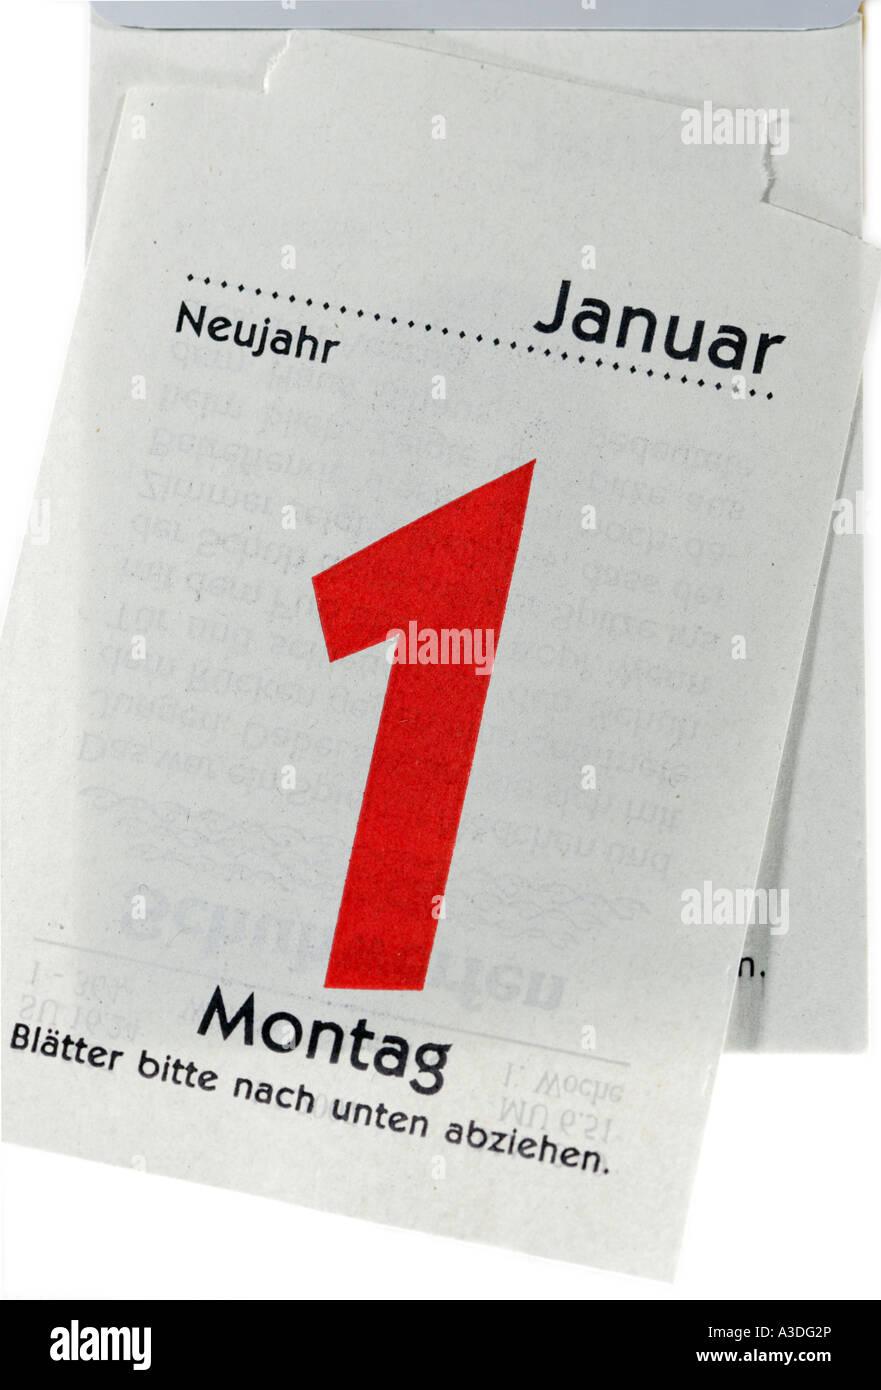 Calendario A Strappo.Calendario A Strappo Immagini Calendario A Strappo Fotos